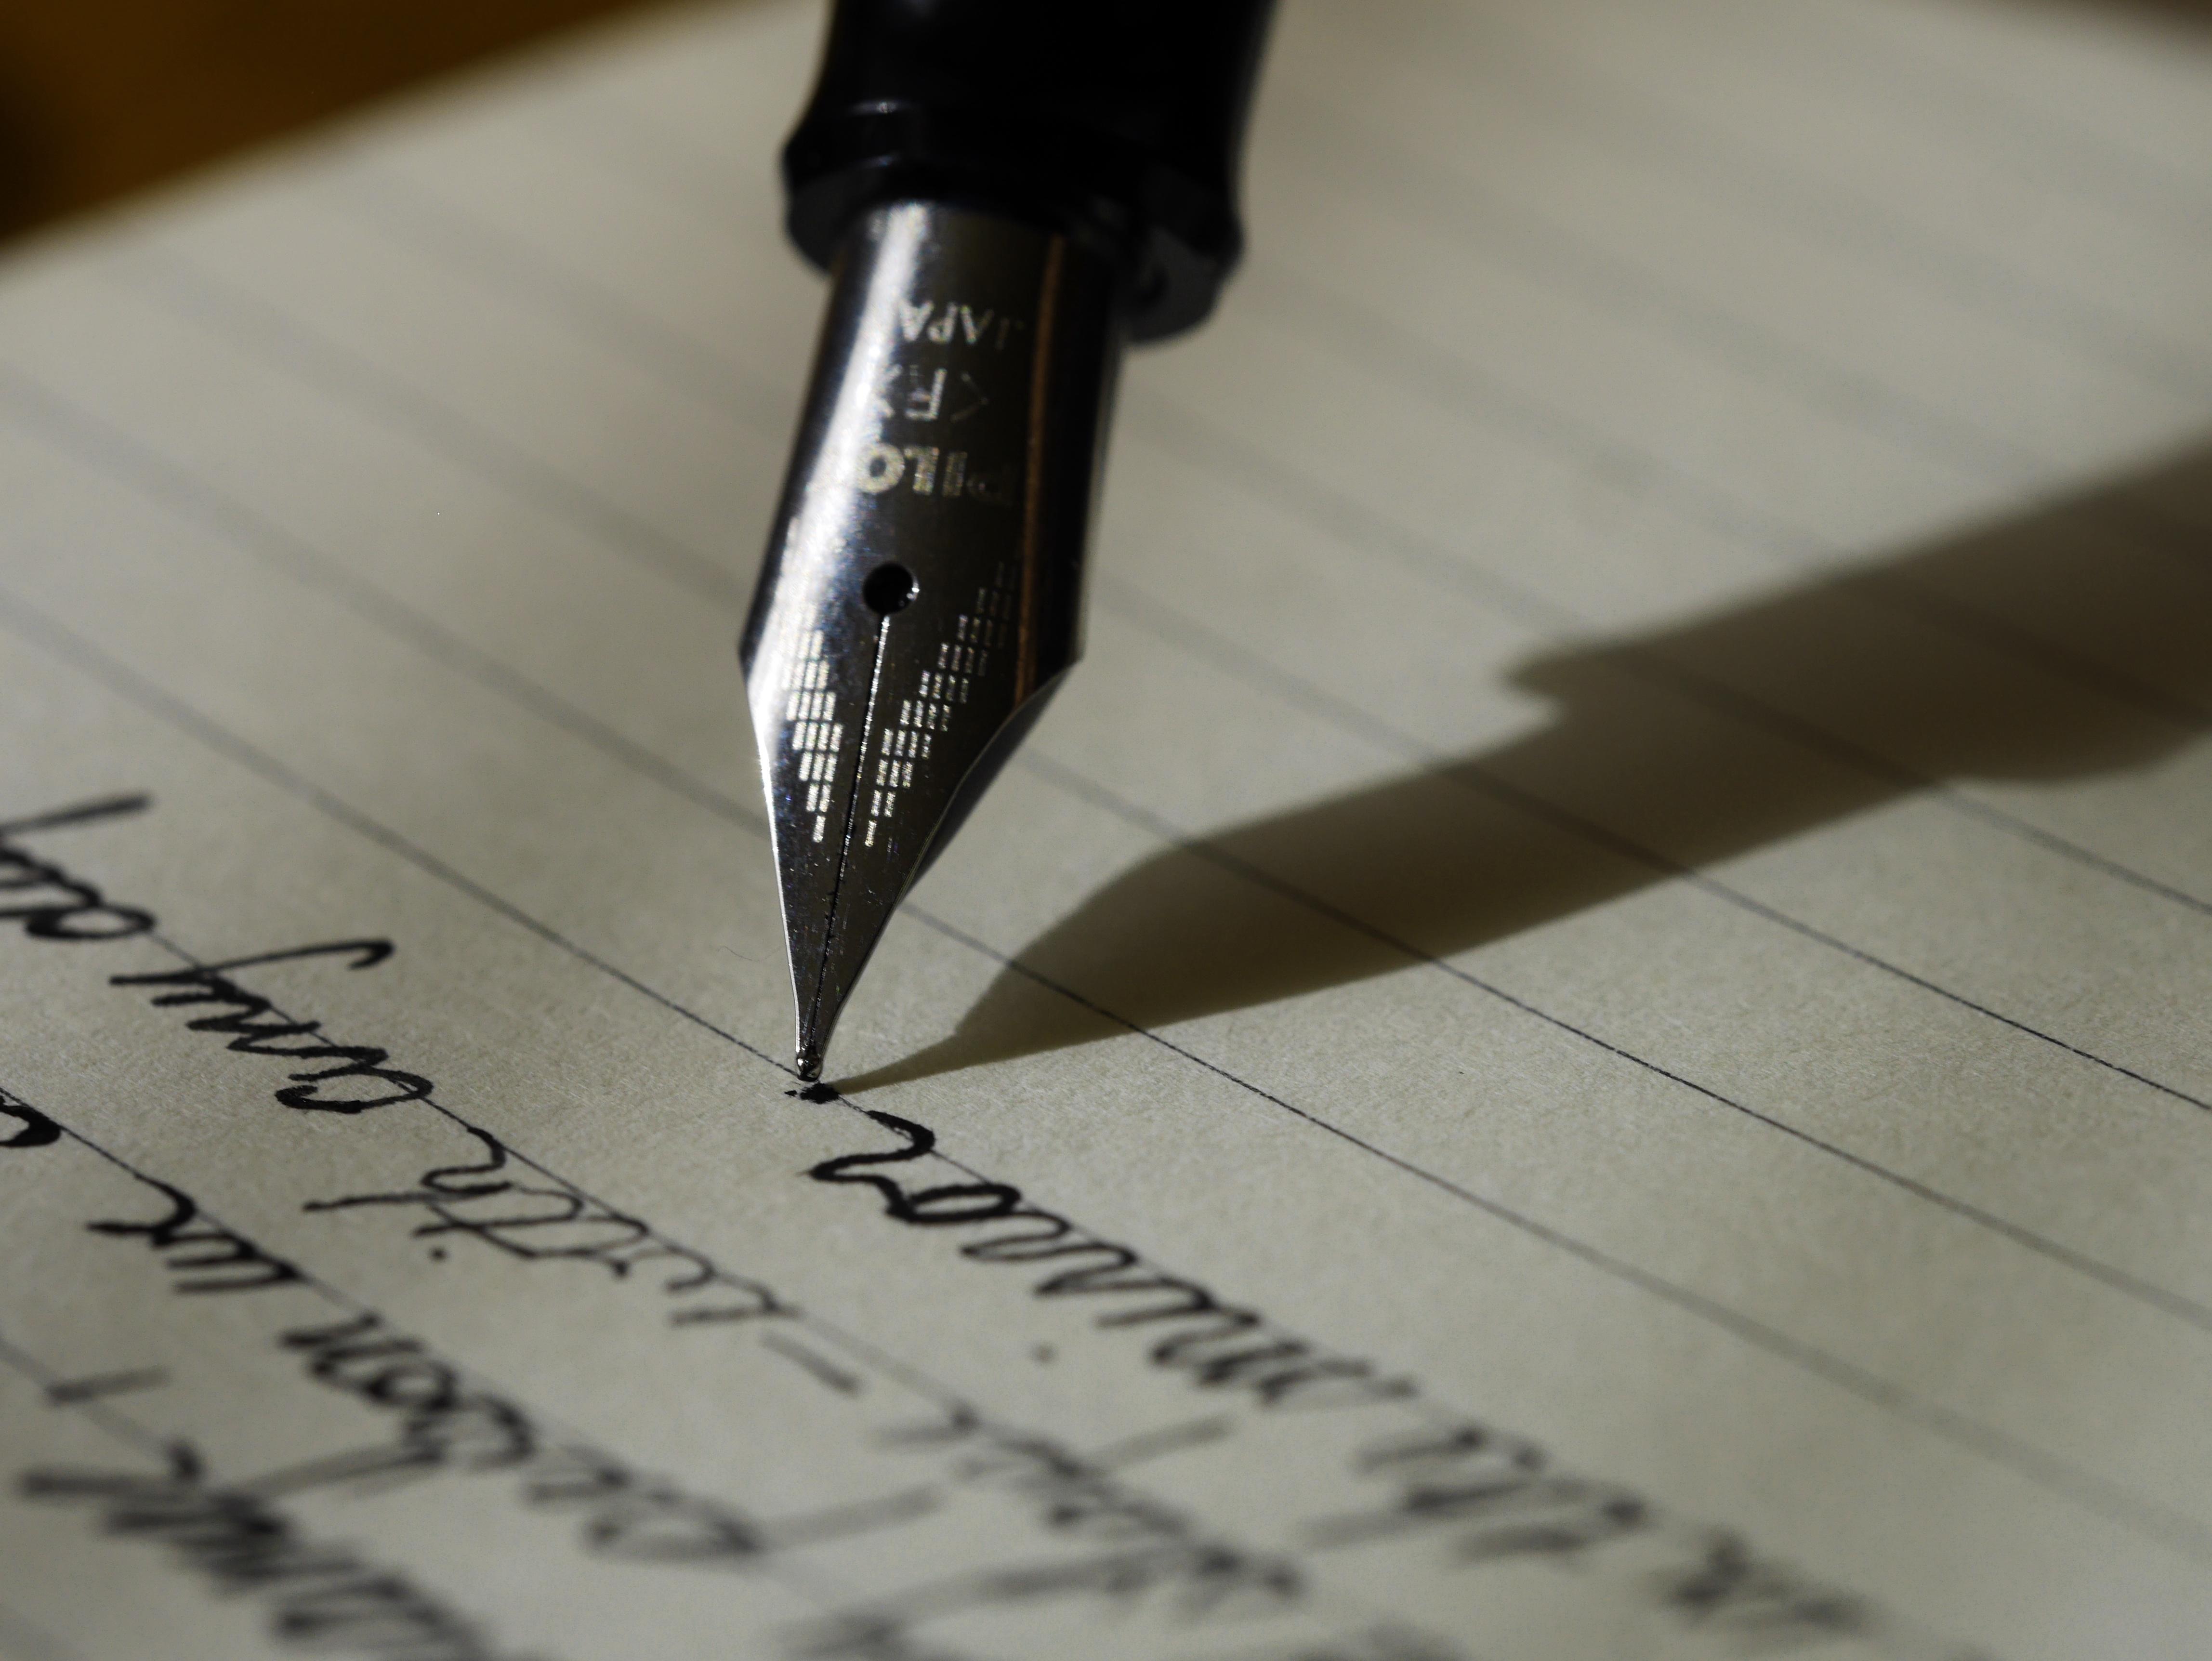 Nib, Copy, Ink, Pen, Write, HQ Photo